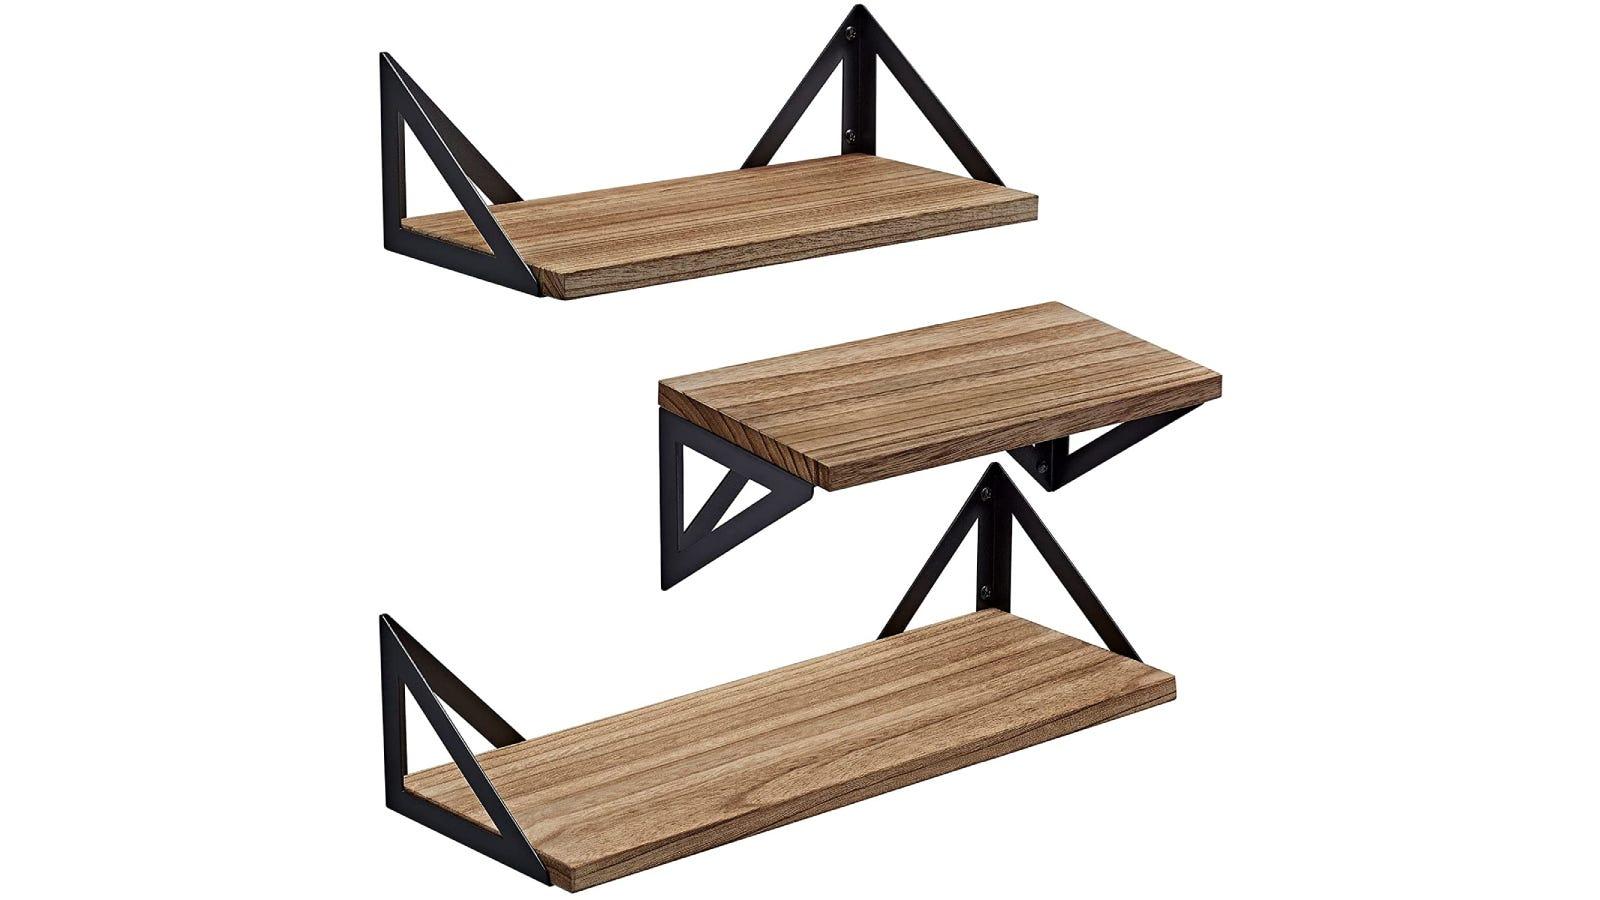 set of three natural wood and black metal shelves